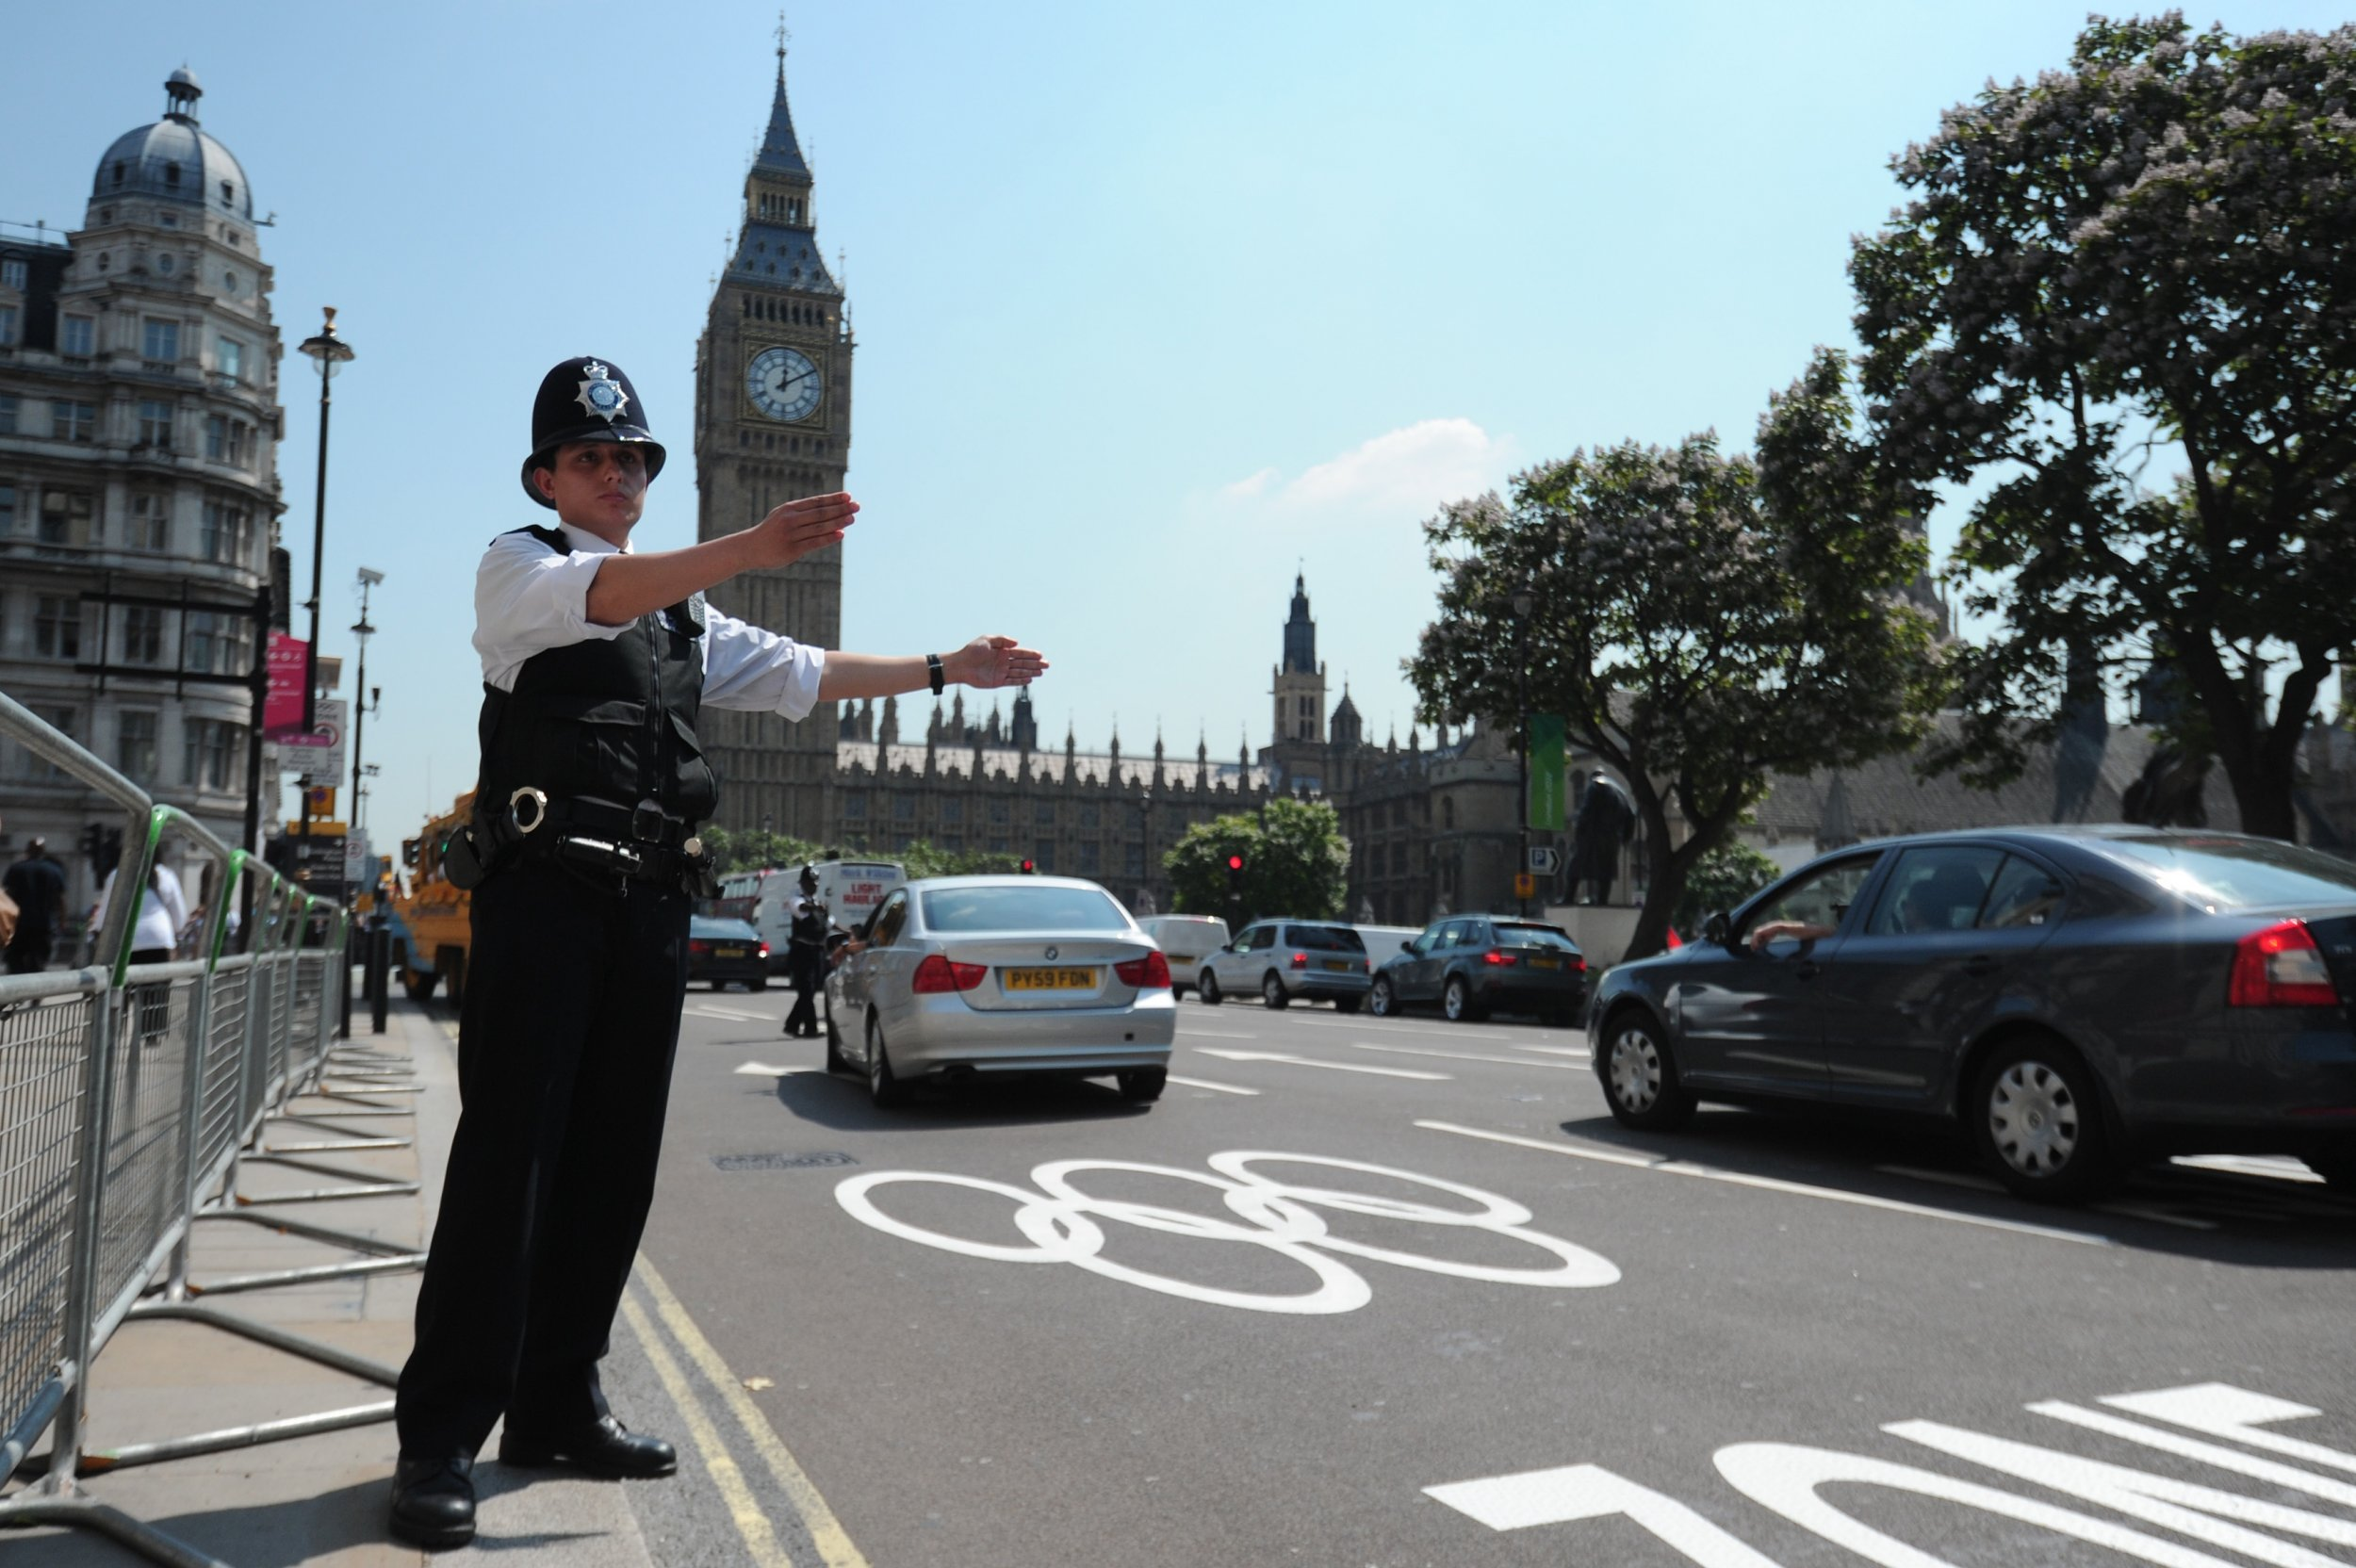 07_04_London_police